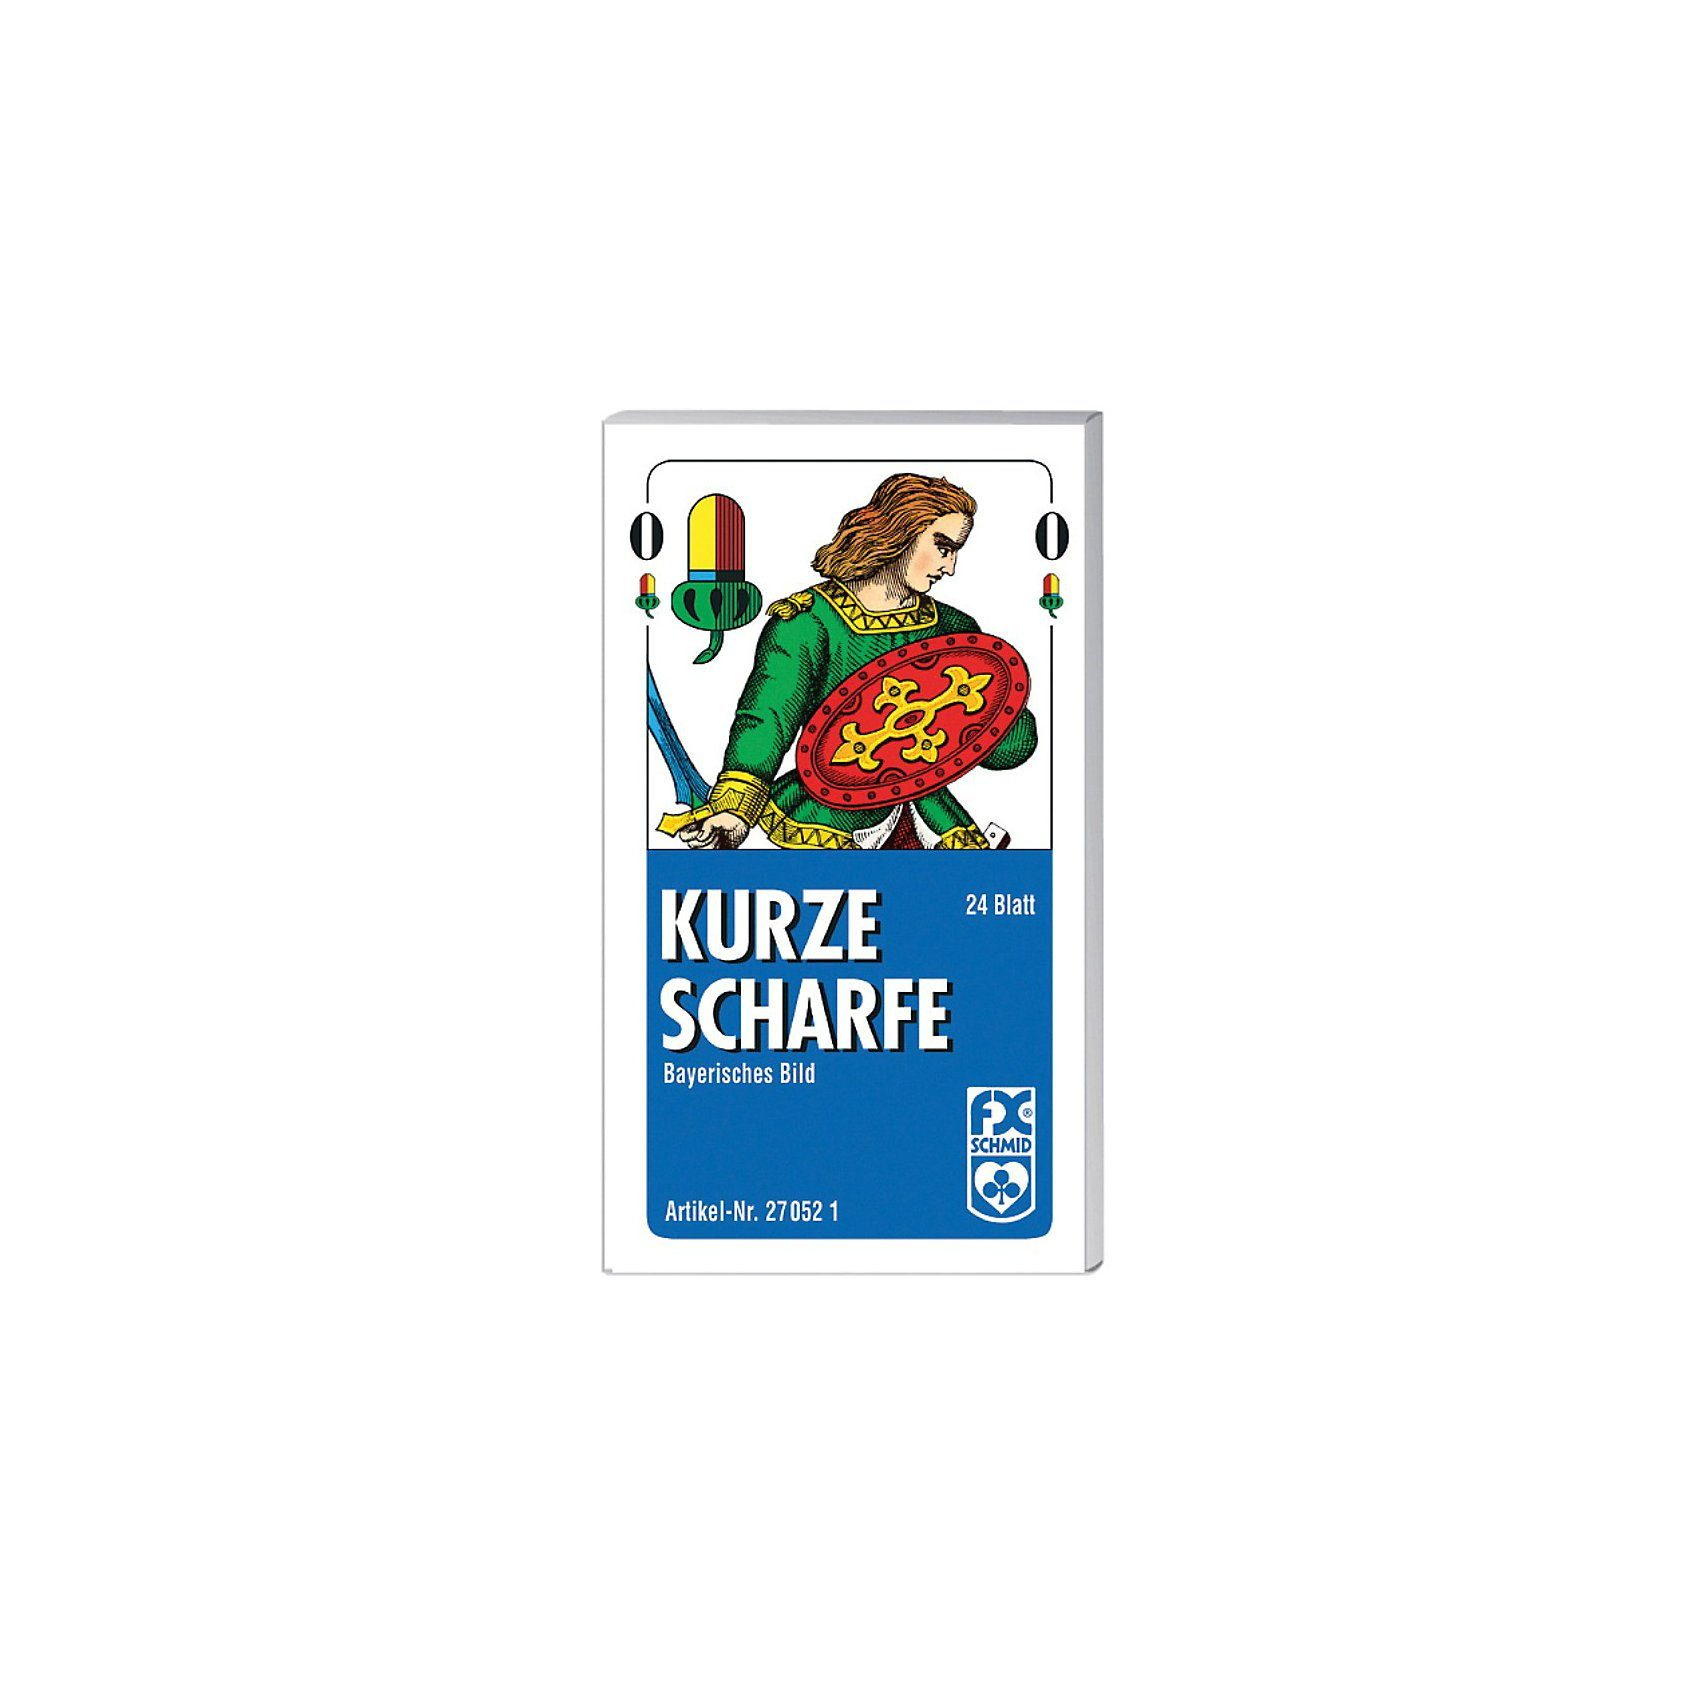 Ravensburger Kurze Scharfe, bayrisches Bild